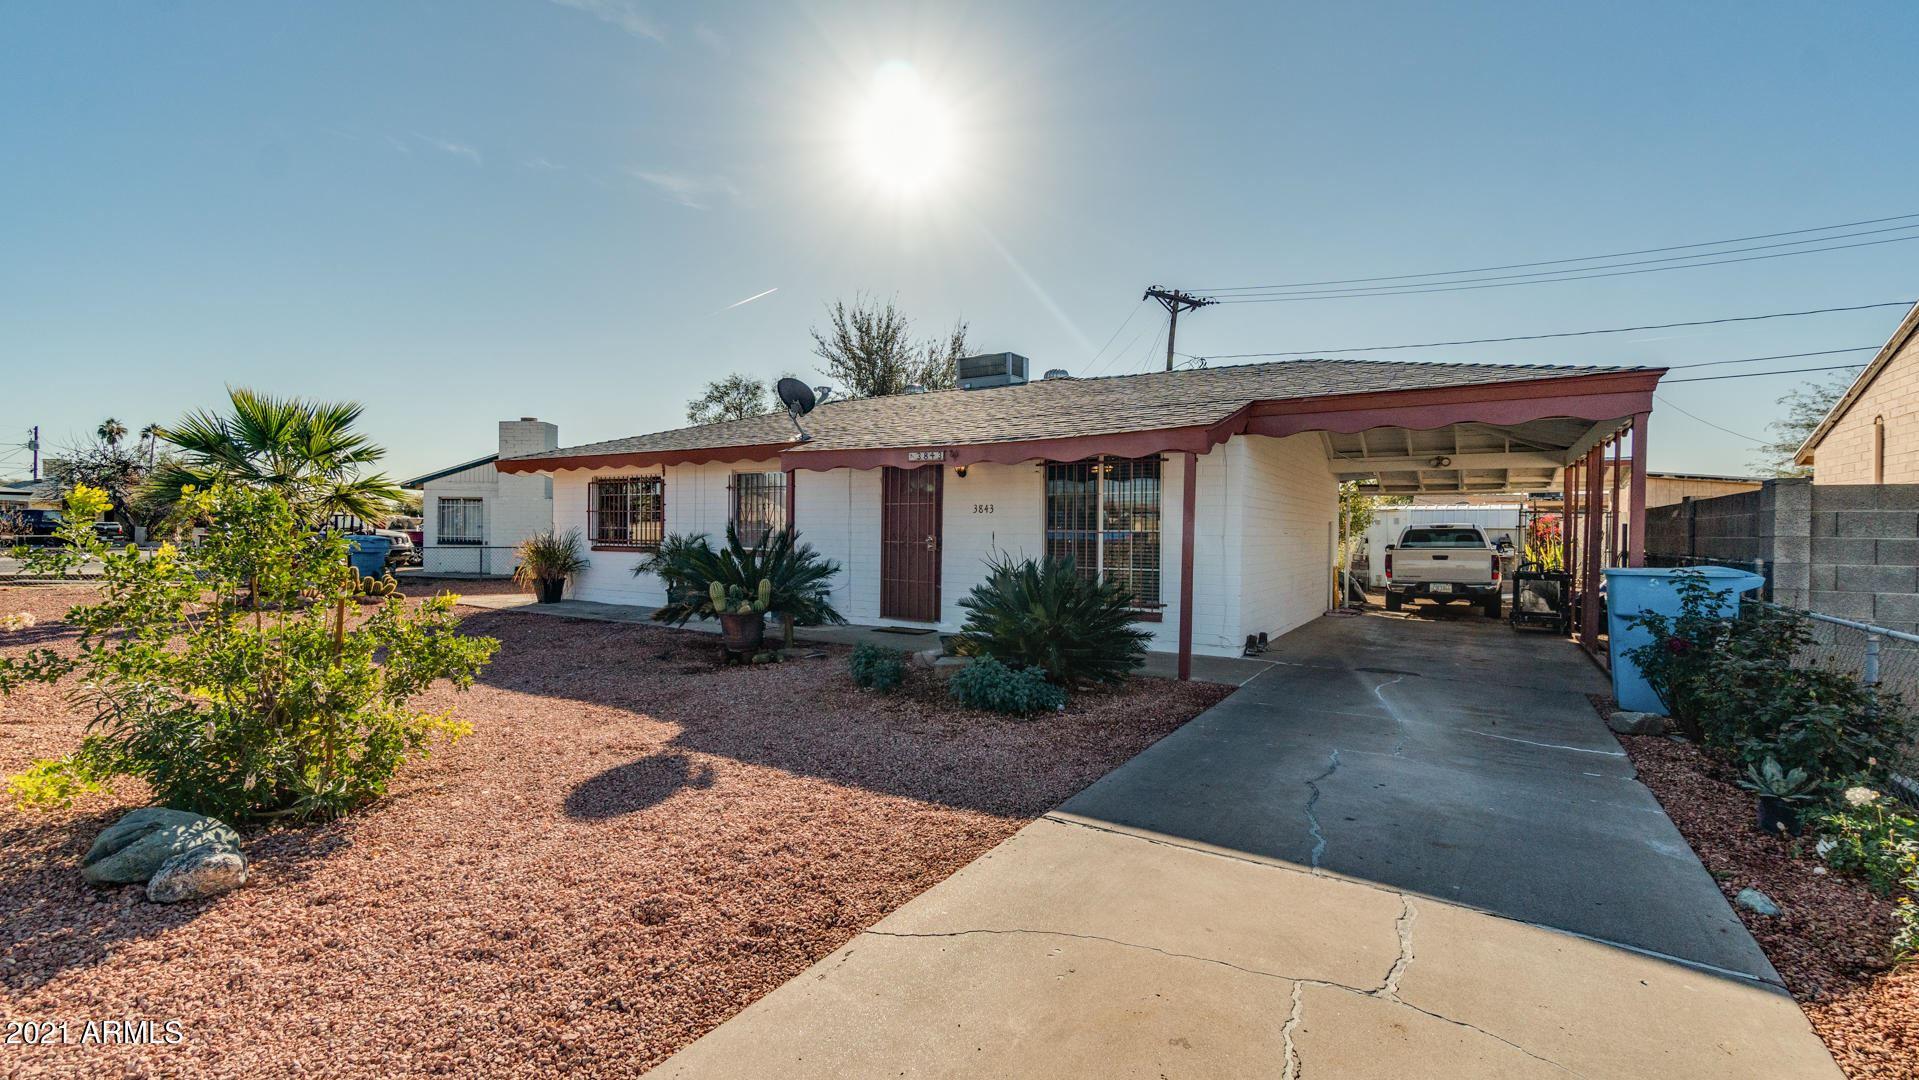 3843 W LEWIS Avenue, Phoenix, AZ 85009 - MLS#: 6178676